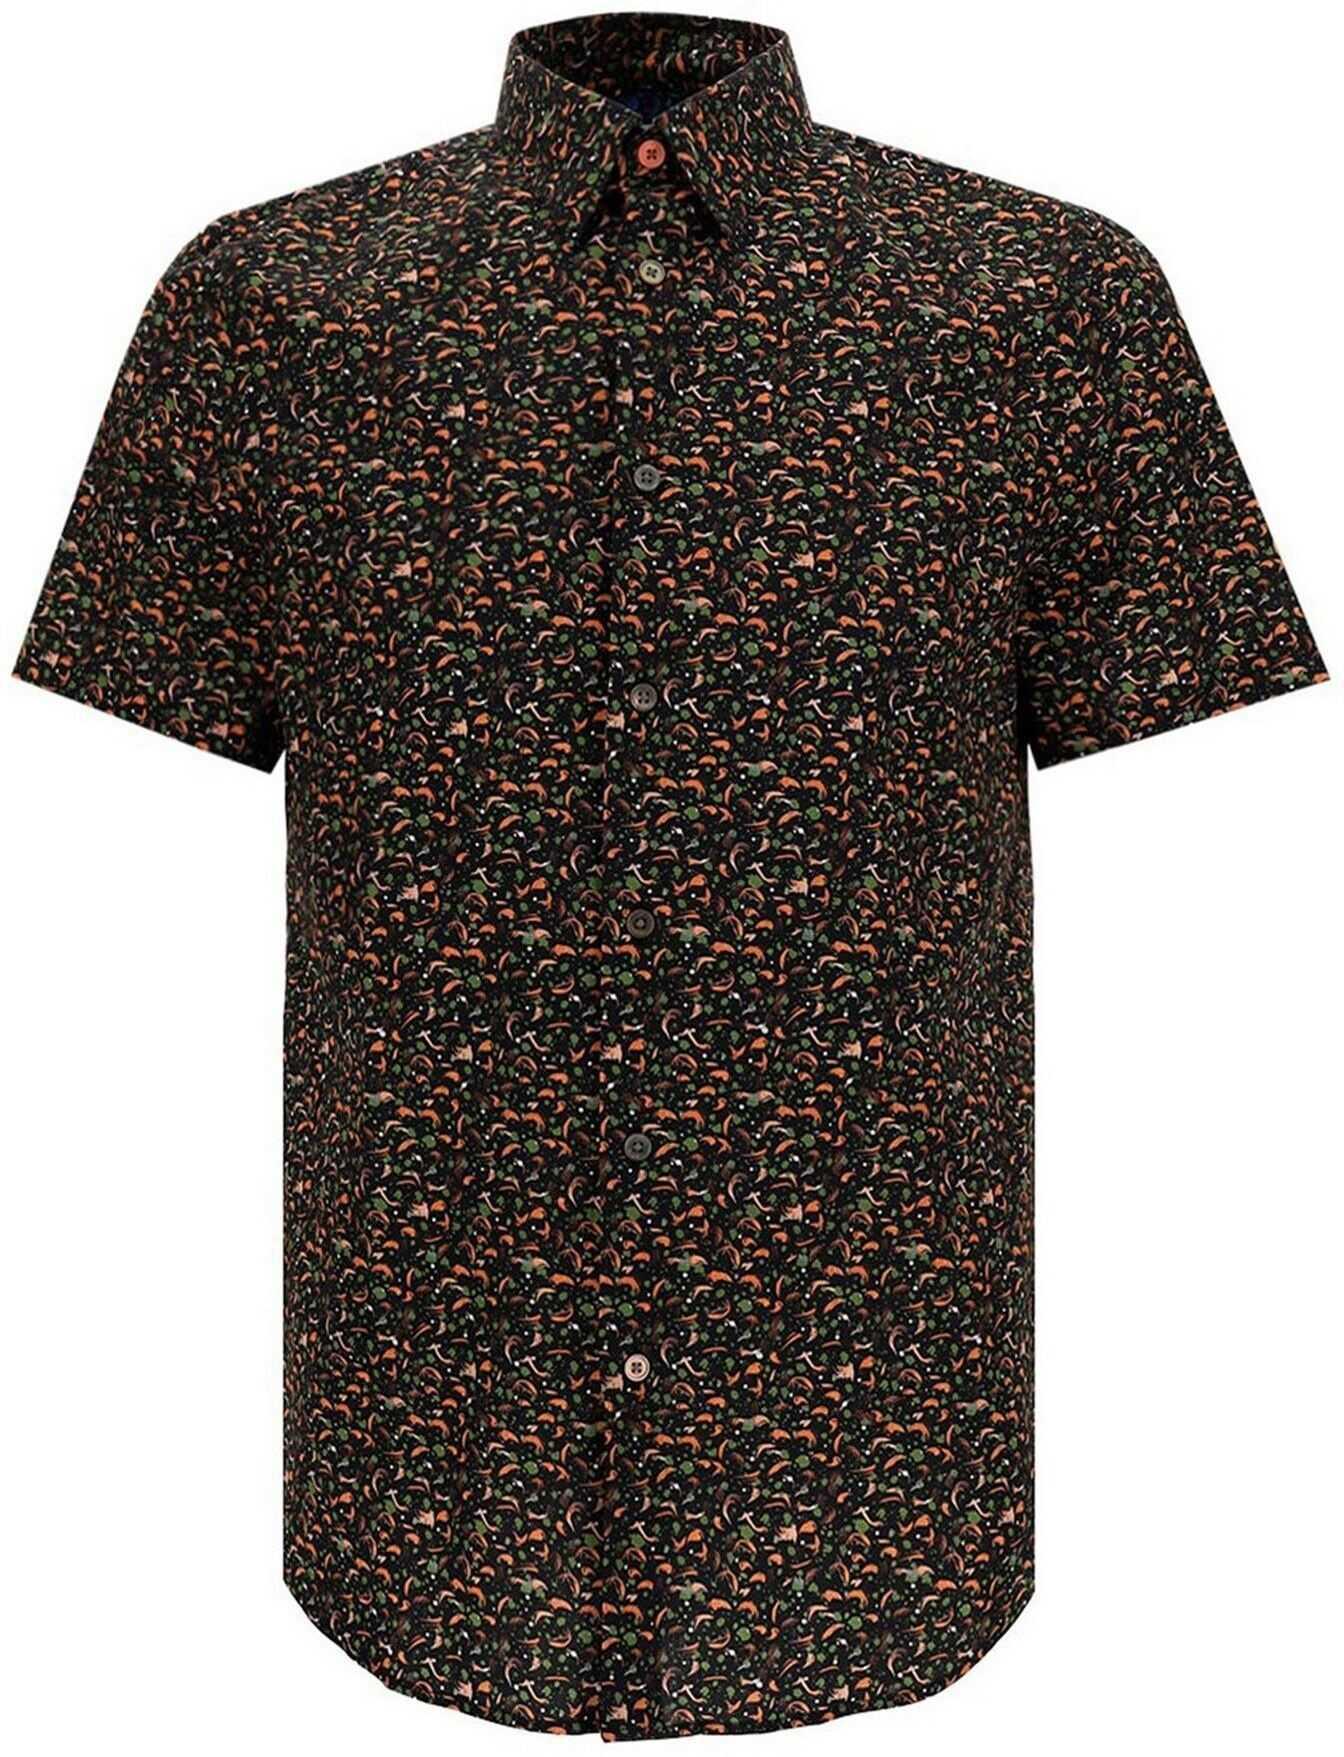 Paul Smith Short Sleeve Printed Shirt In Brown Brown imagine